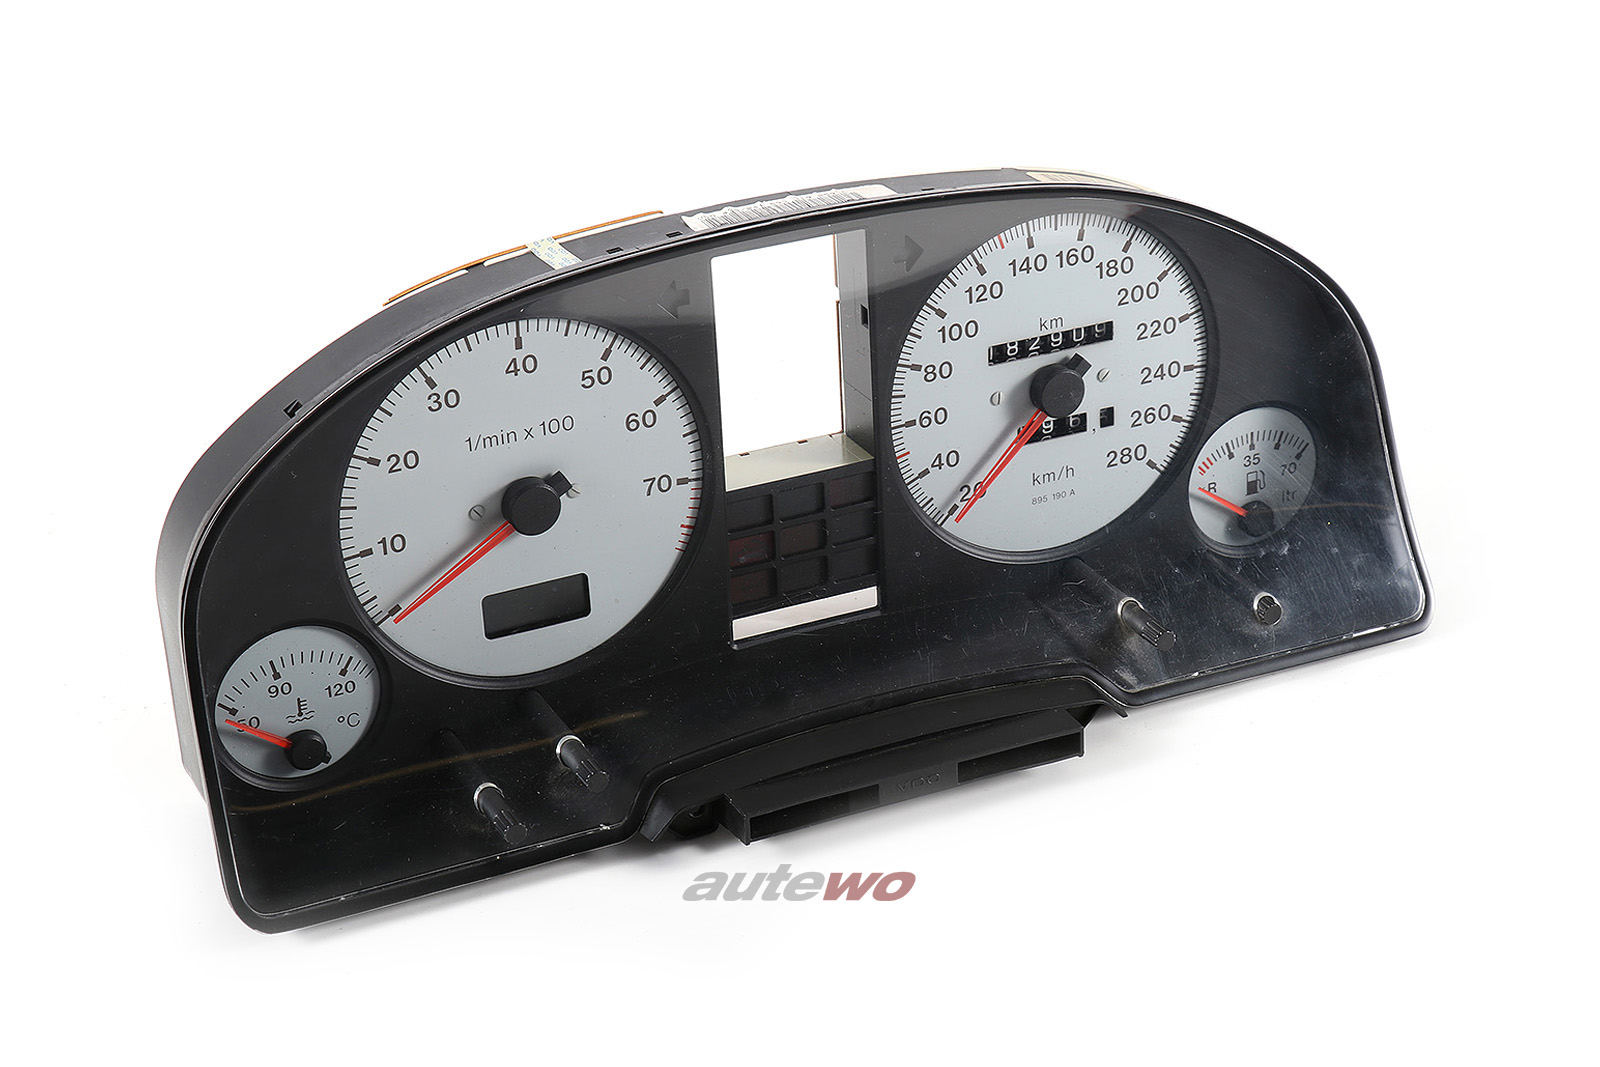 895919033AL Audi S2 B4/Coupe Typ 89 2.2l VDO Kombiinstrument mit 280km/h Tacho